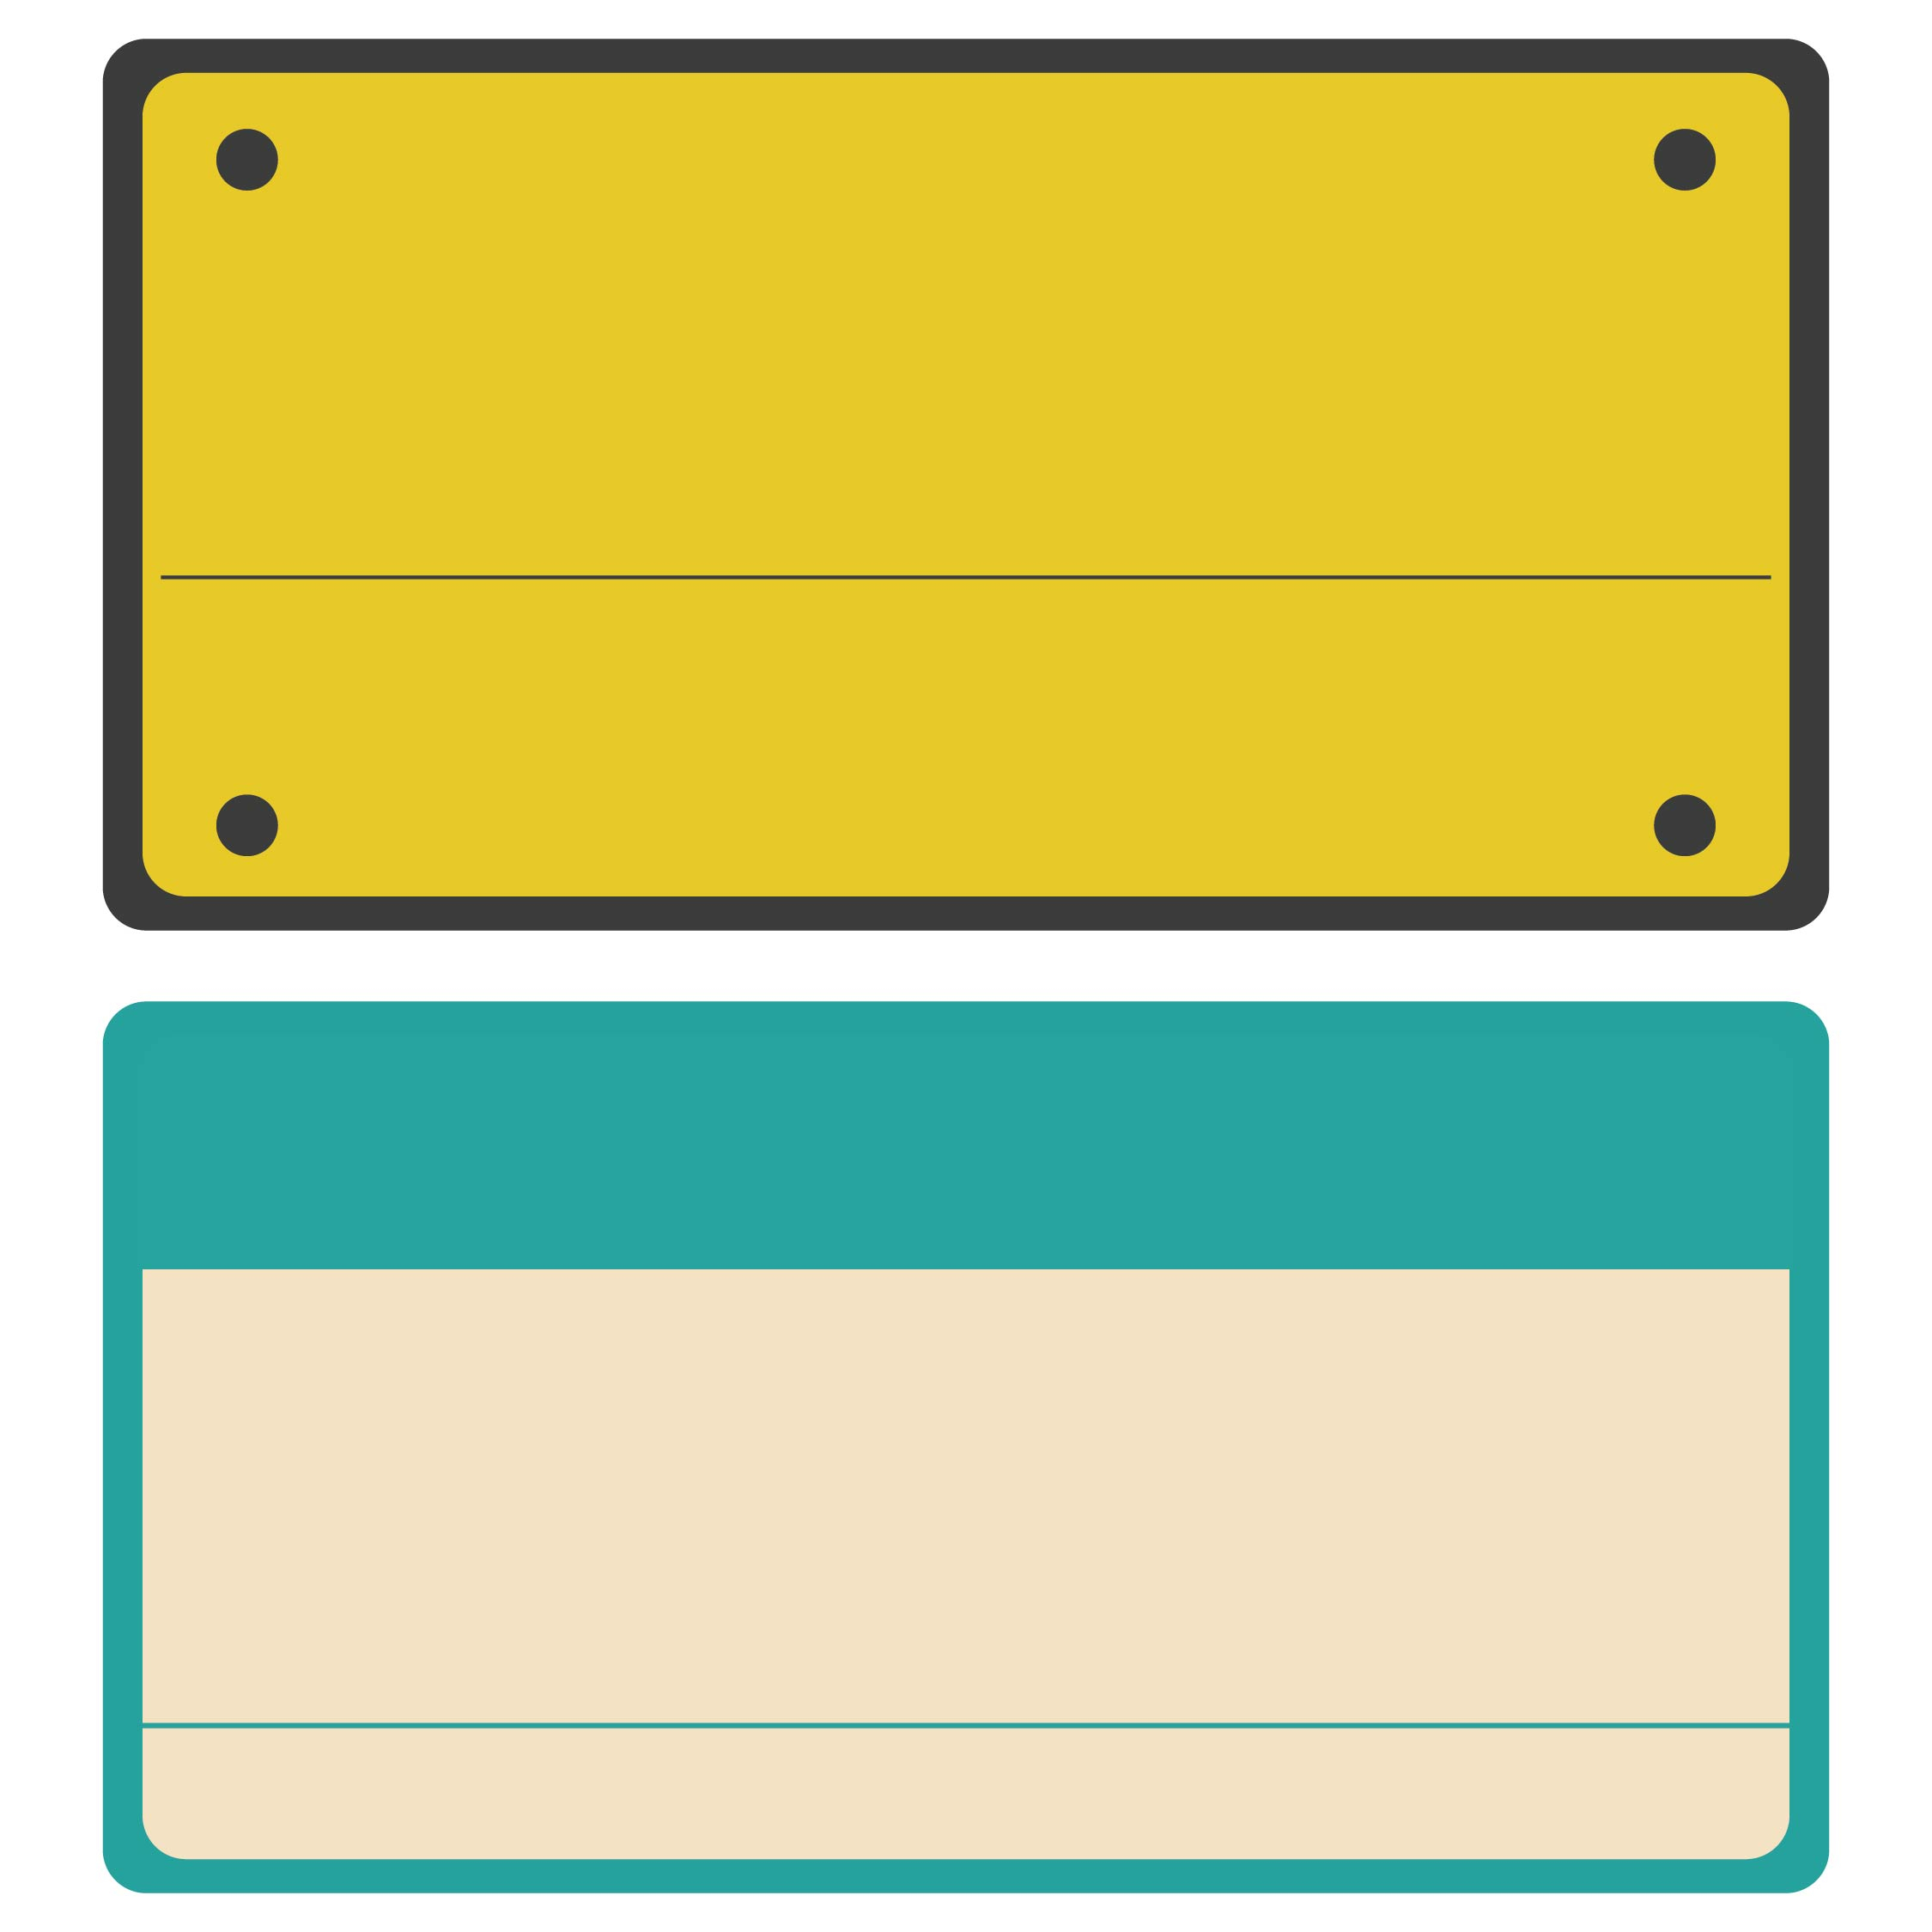 6 Best California License Plate Printable Template